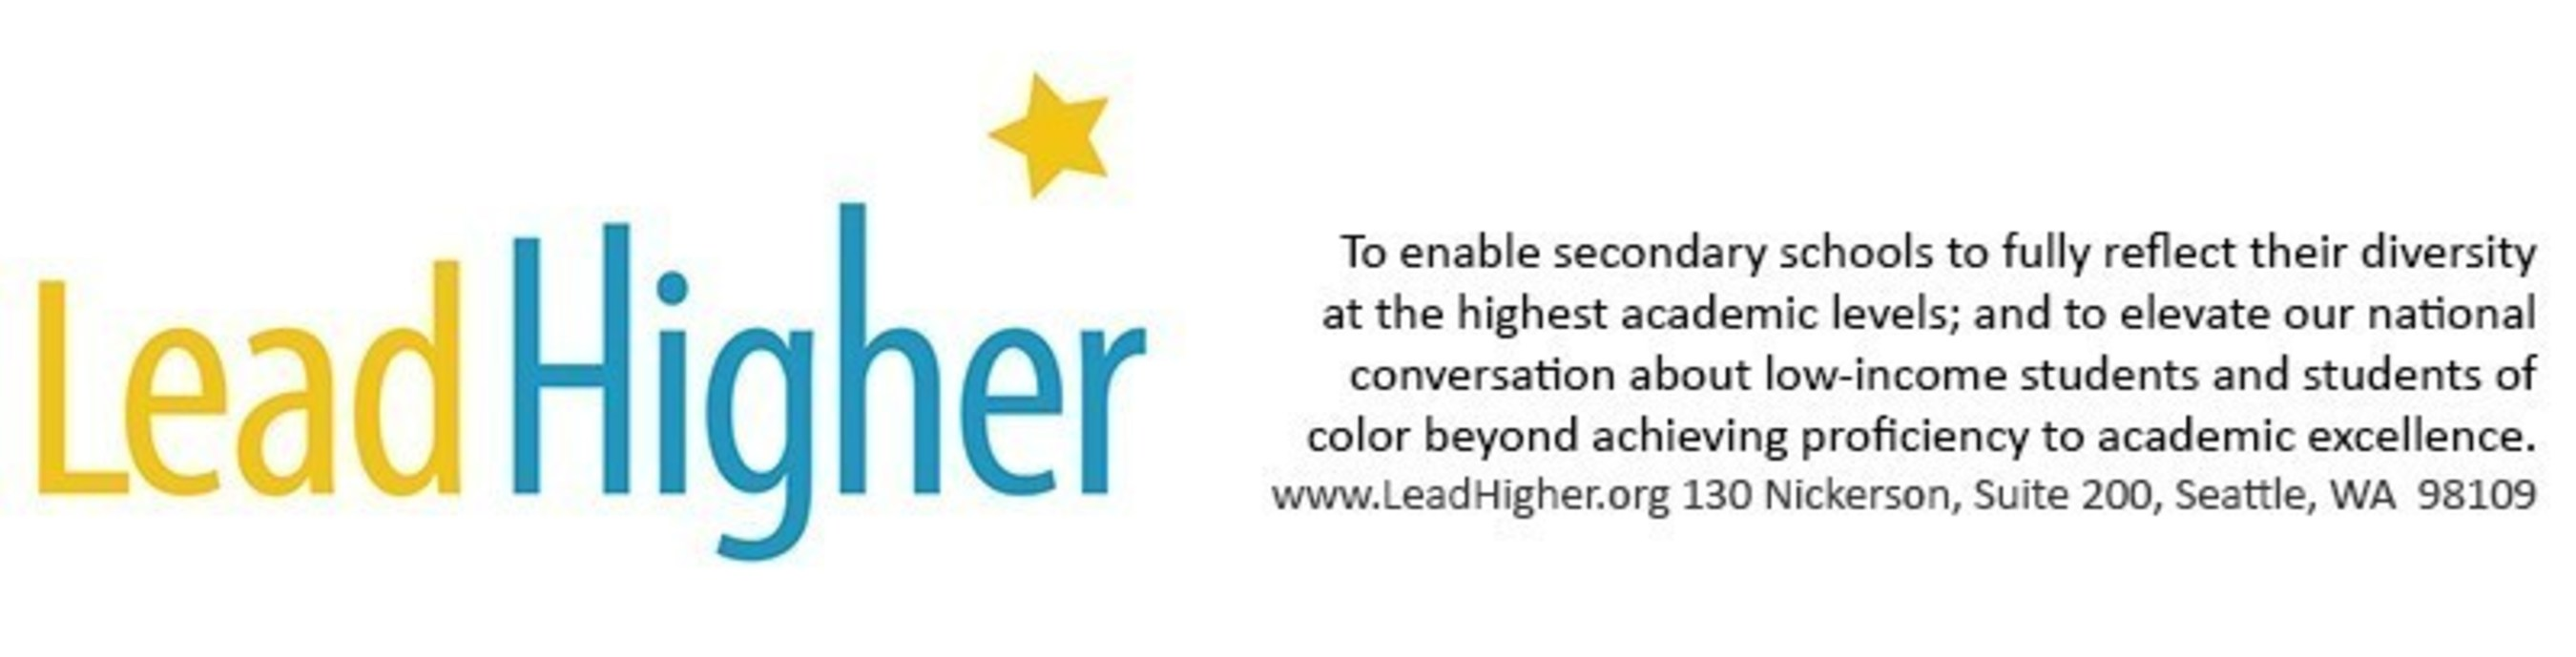 Lead Higher Logo